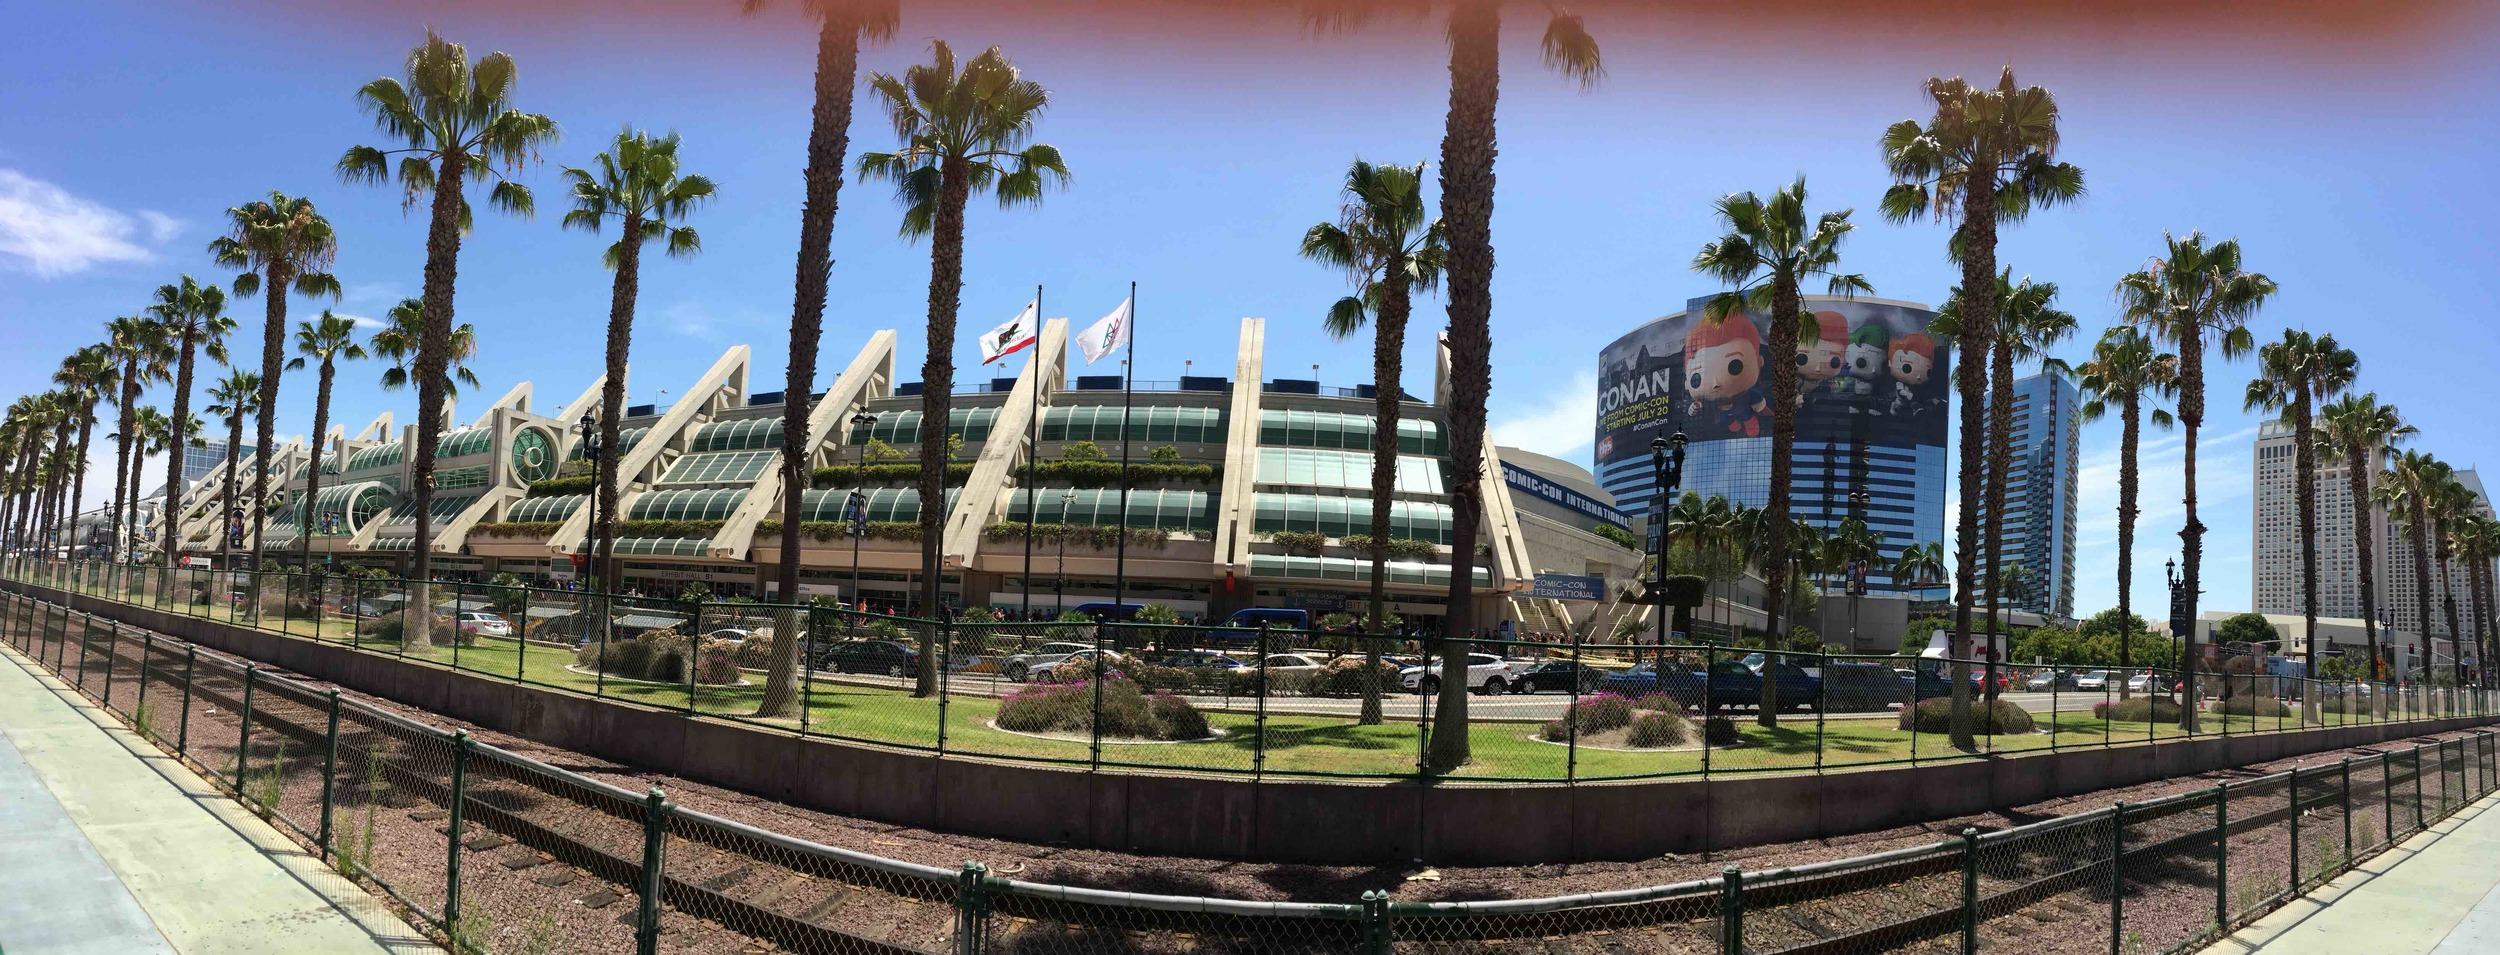 Comic Con 2016 San Diego